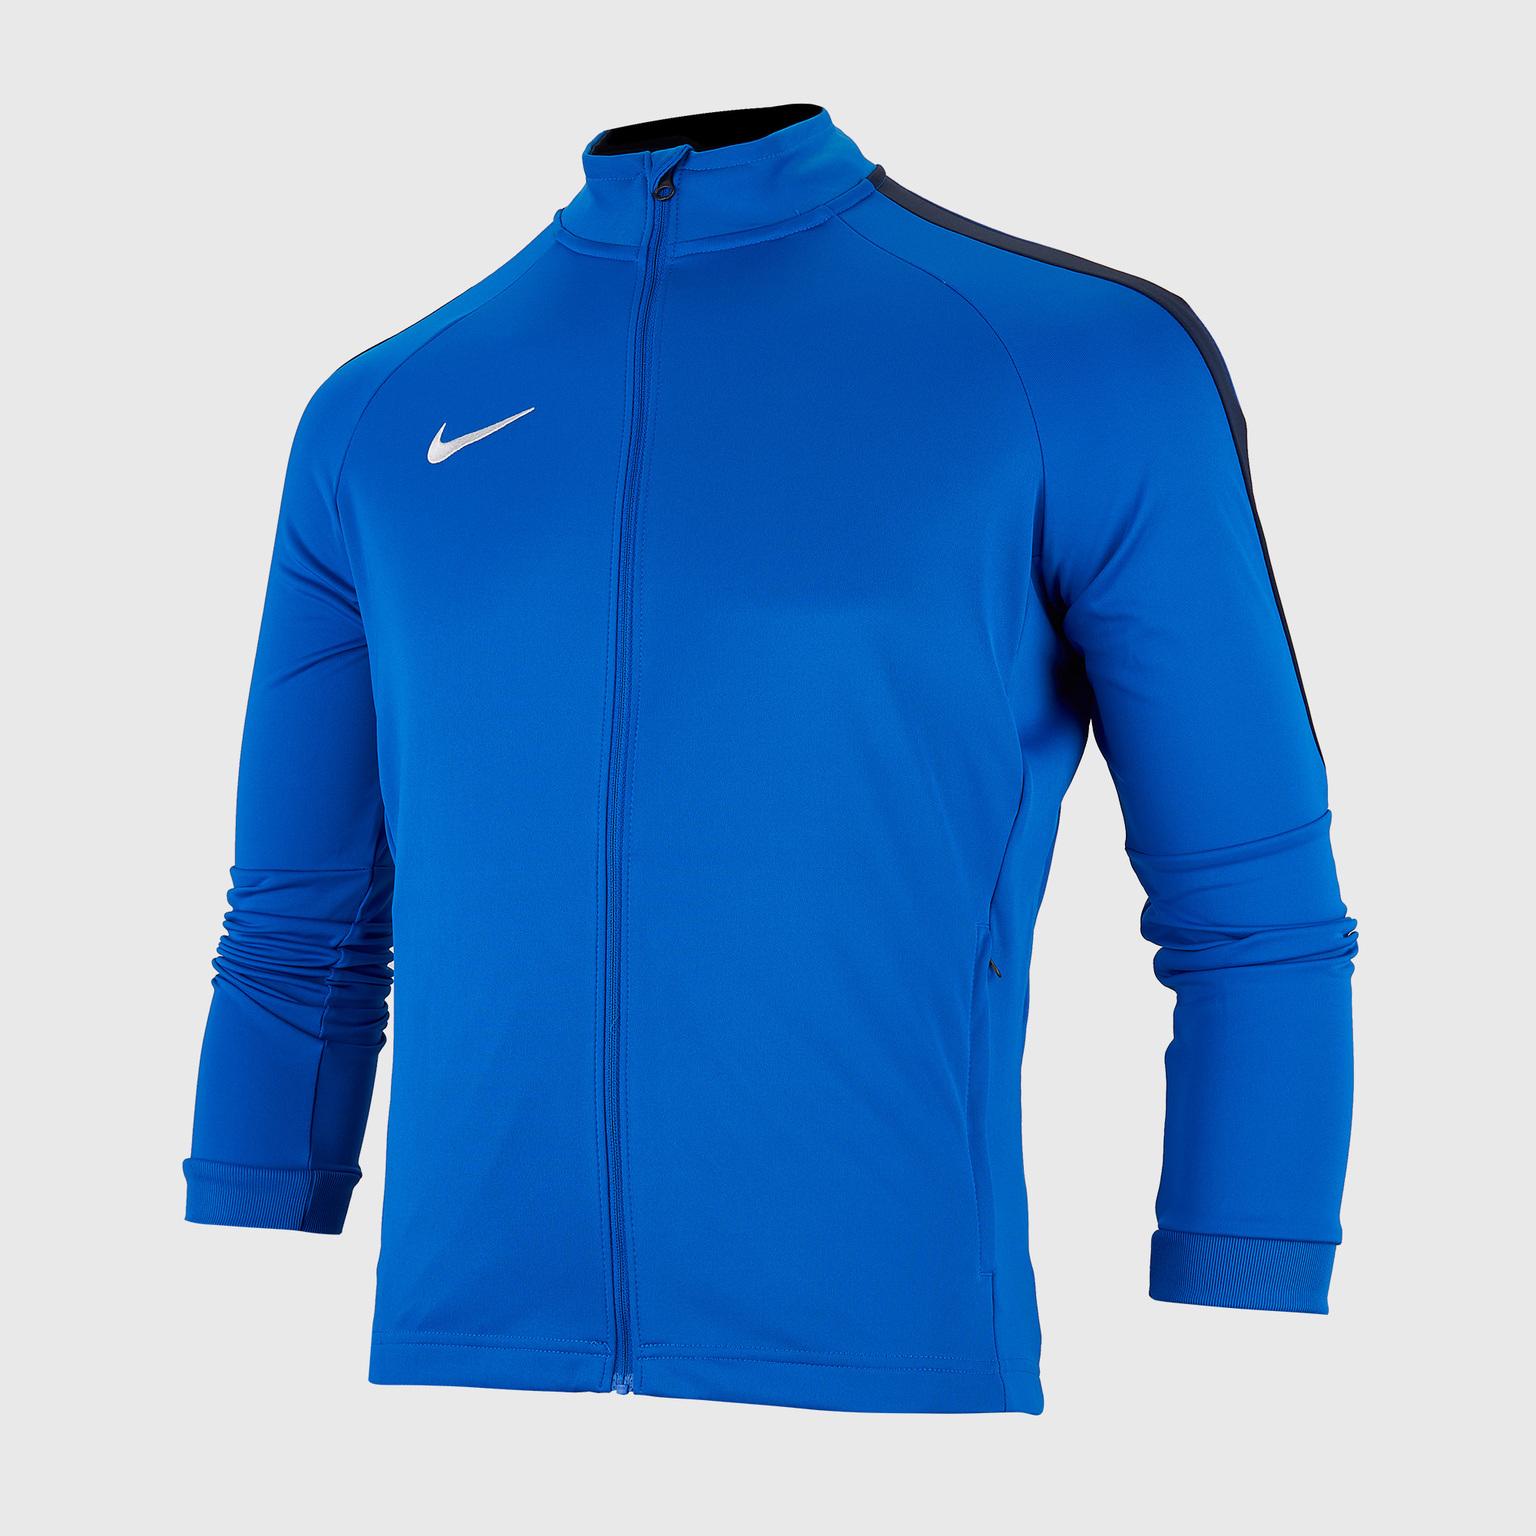 Куртка для костюма подростковая Nike Dry Academy18 893751-463 цена